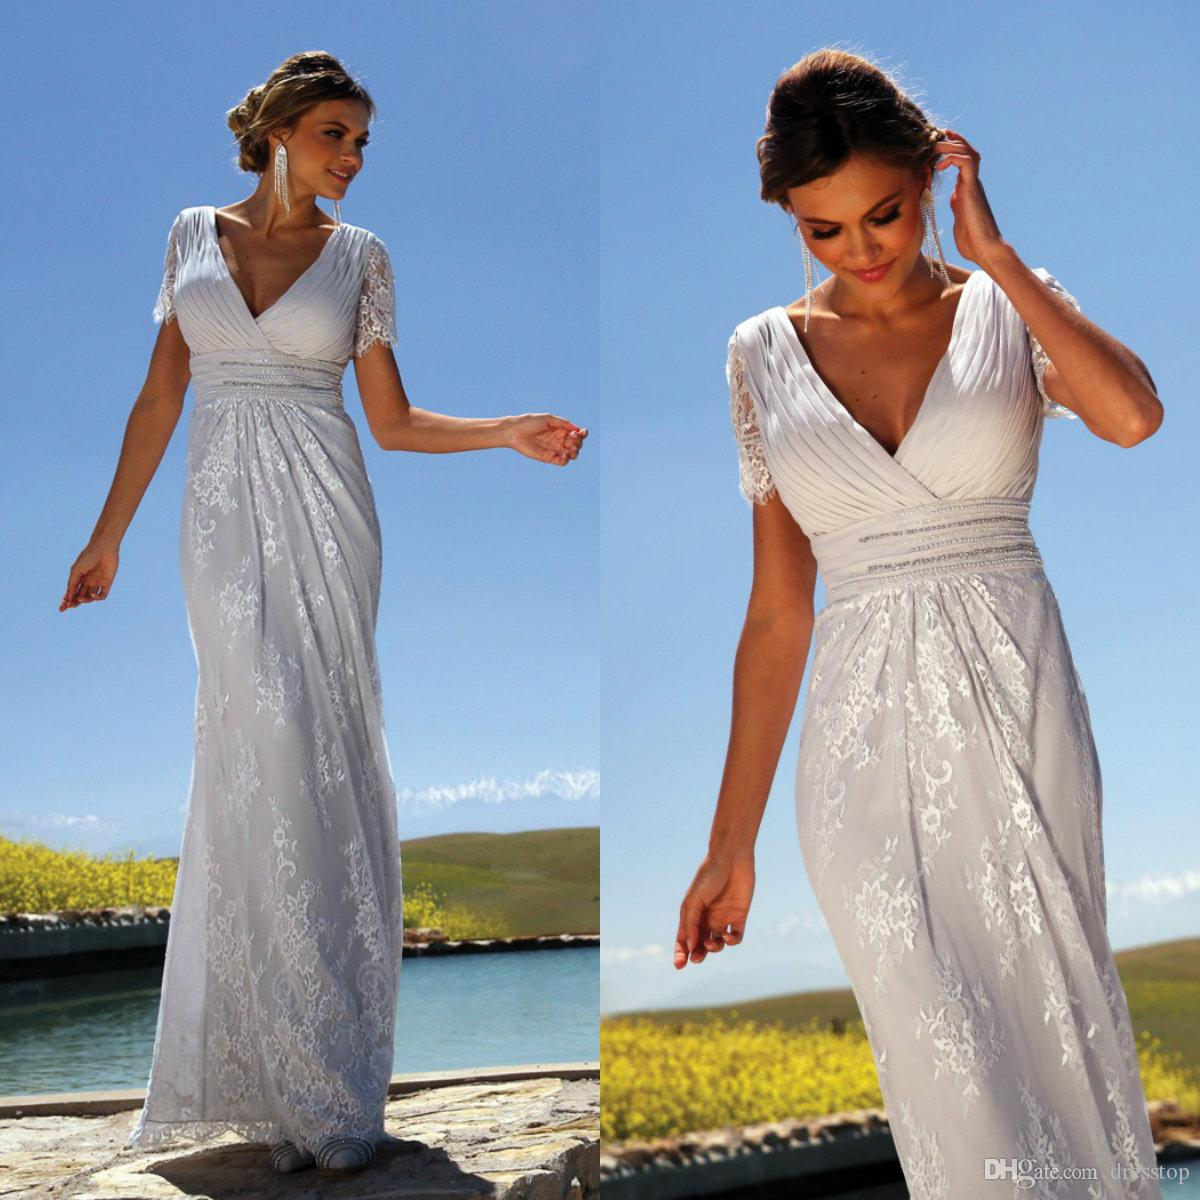 Elegant A Line Lace Mother Of The Bride Dresses Plus Size Chiffon Floor Length Short Sleeve Linea Raffealli Mothers Wedding Guest Dress